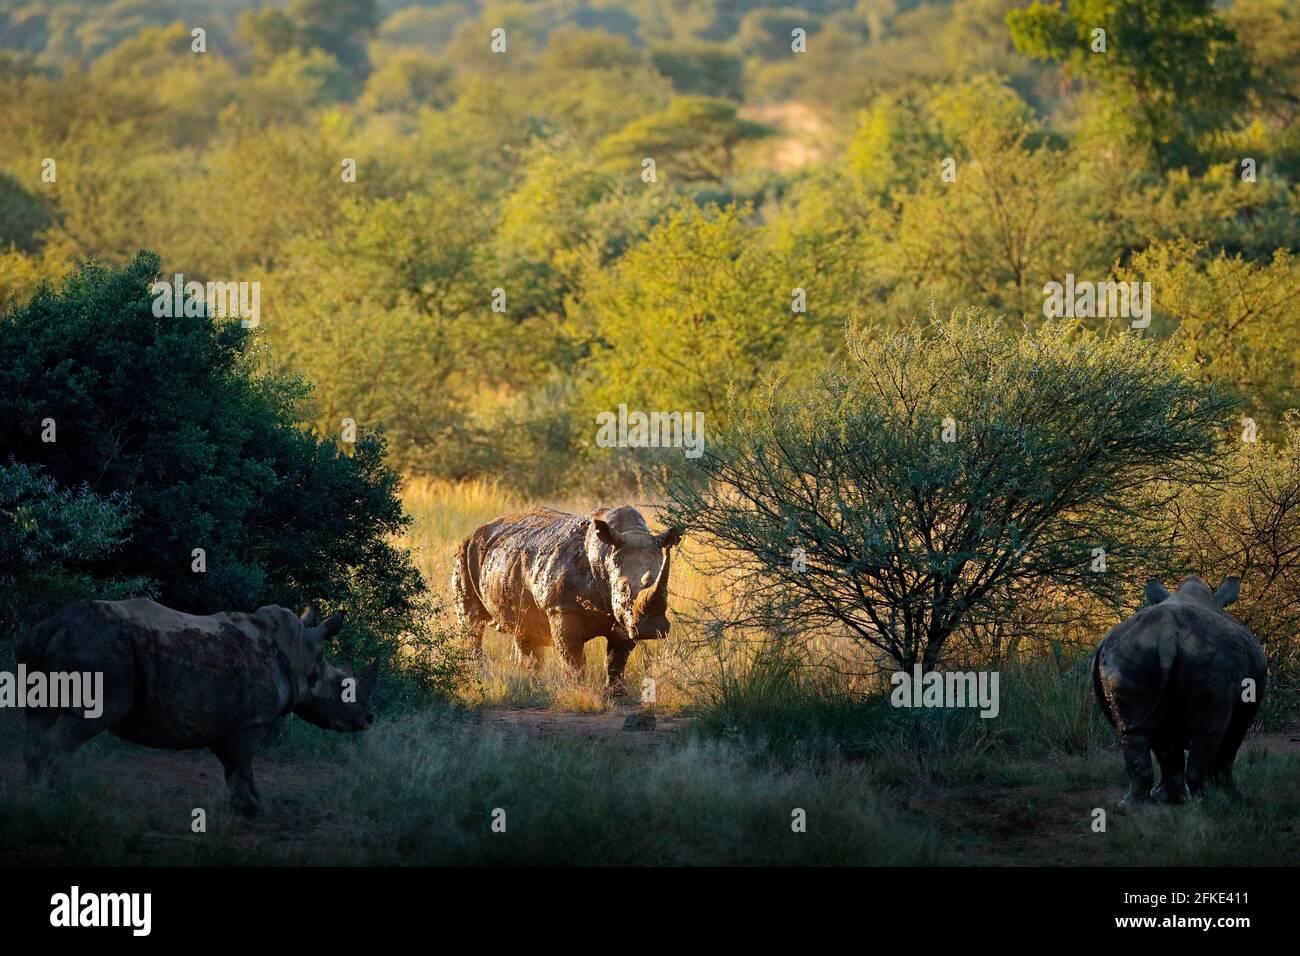 Rhino dans l'habitat forestier. Rhinocéros blancs, Ceratotherium simum, avec cornes, dans l'habitat naturel, Pilanesberg, Afrique du Sud. Scène sauvage du natu Banque D'Images